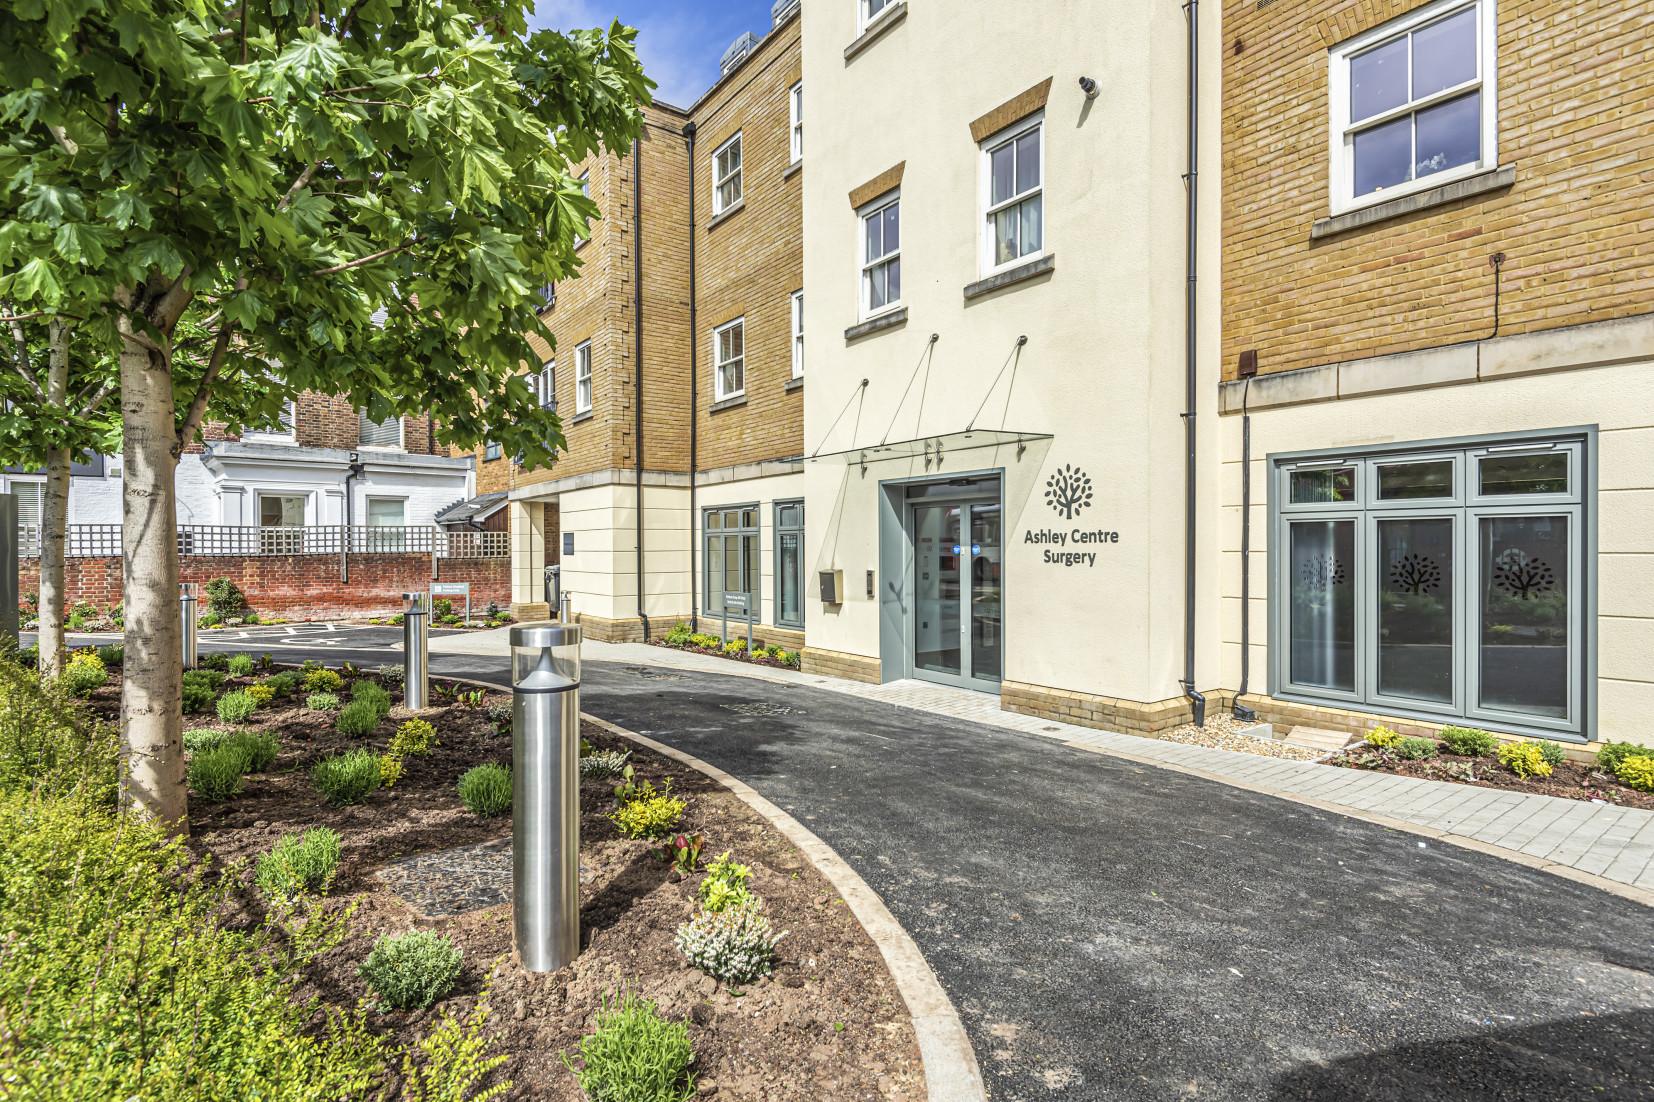 Ashley Centre Surgery - Epsom, Surrey